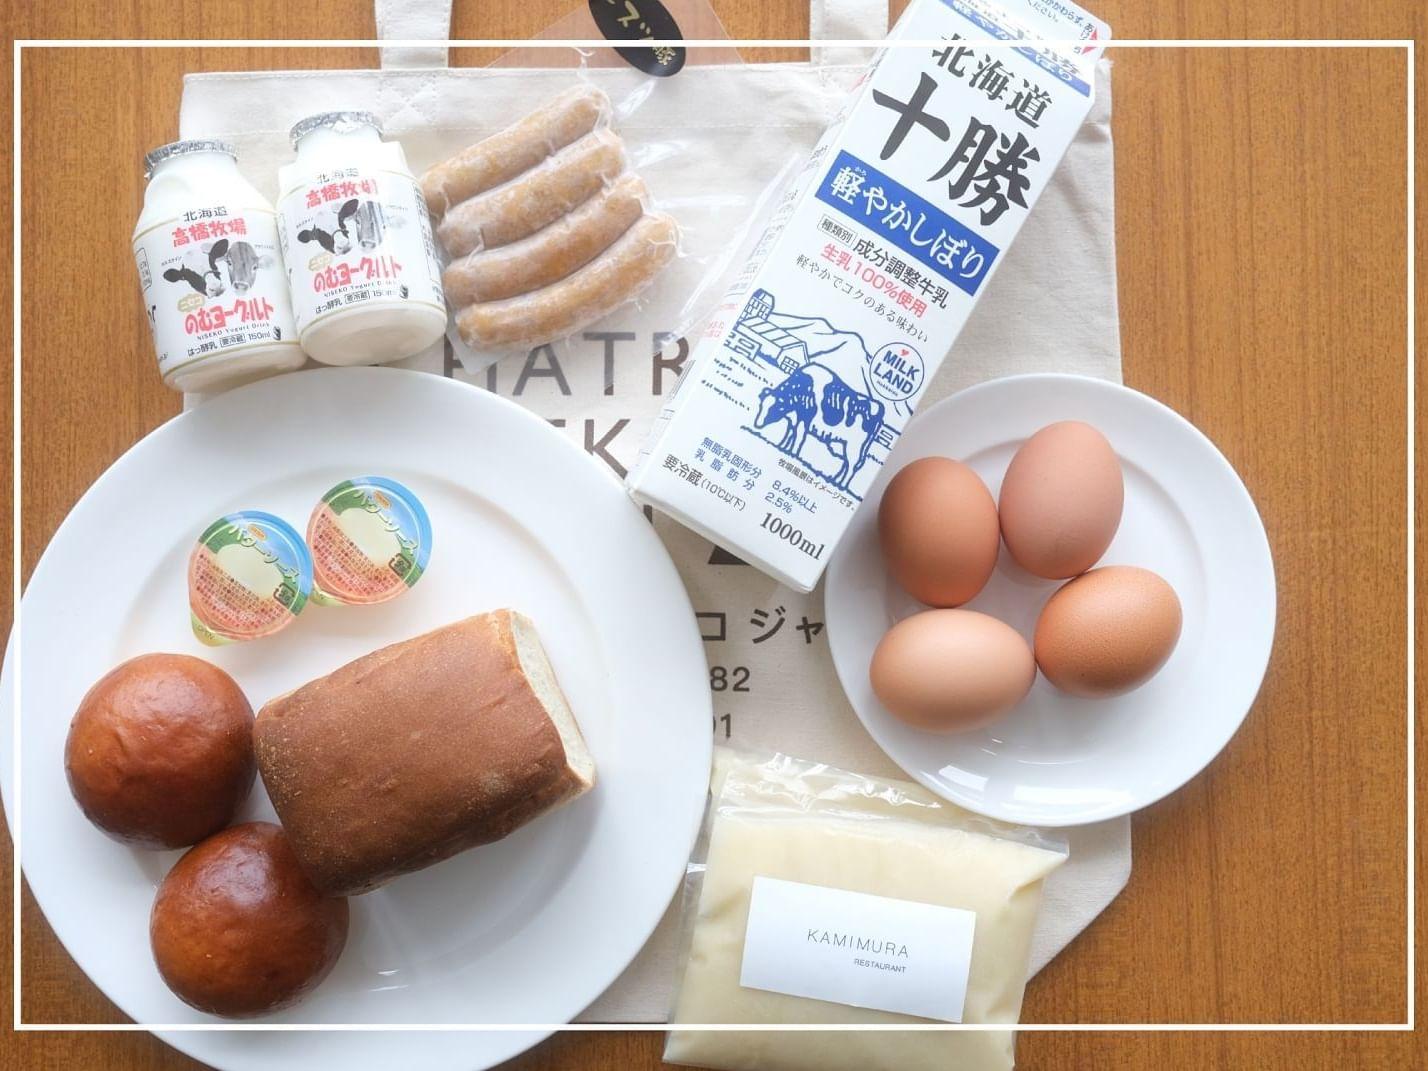 Breakfast hamper with eggs, bread and milk at Chatrium Niseko Japan